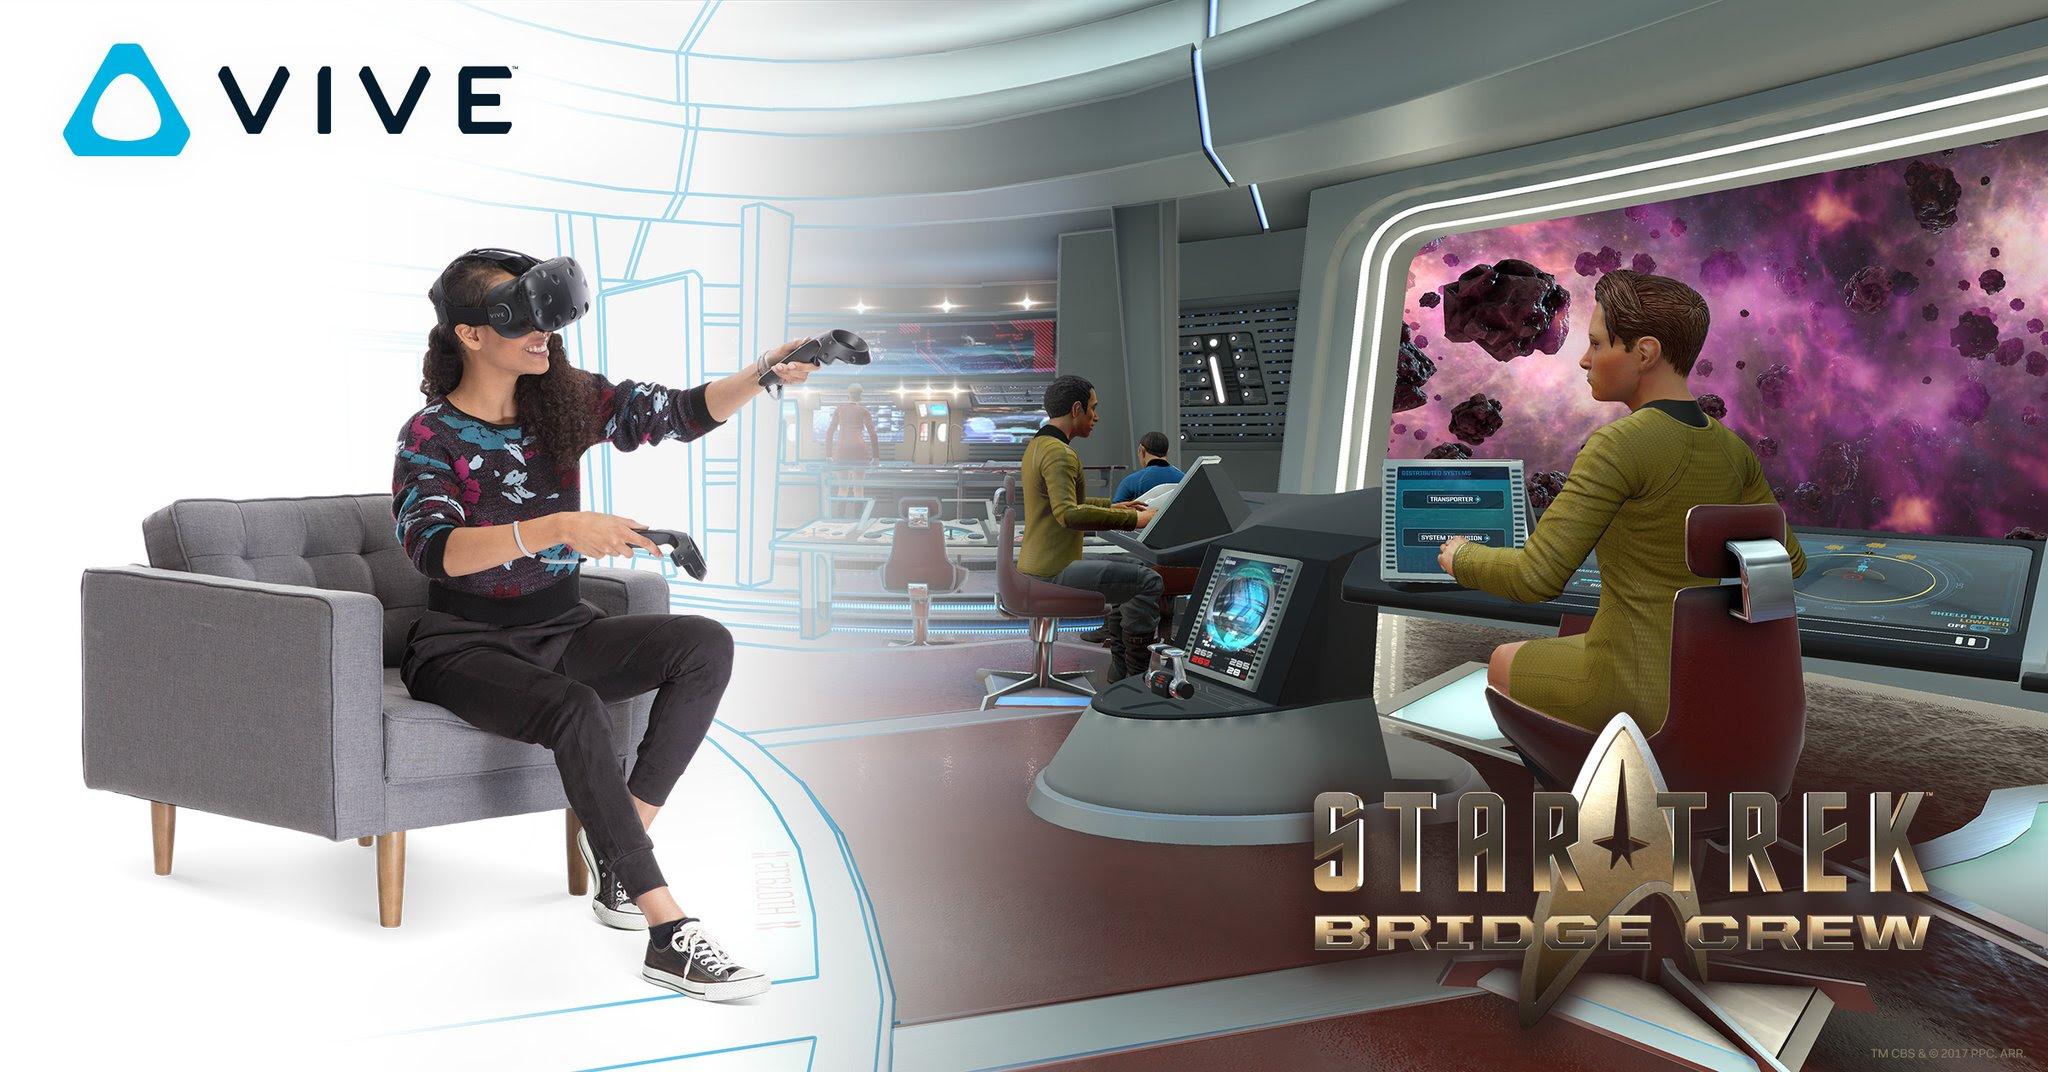 Star Trek: Bridge Crew now comes bundled with Vive headsets screenshot